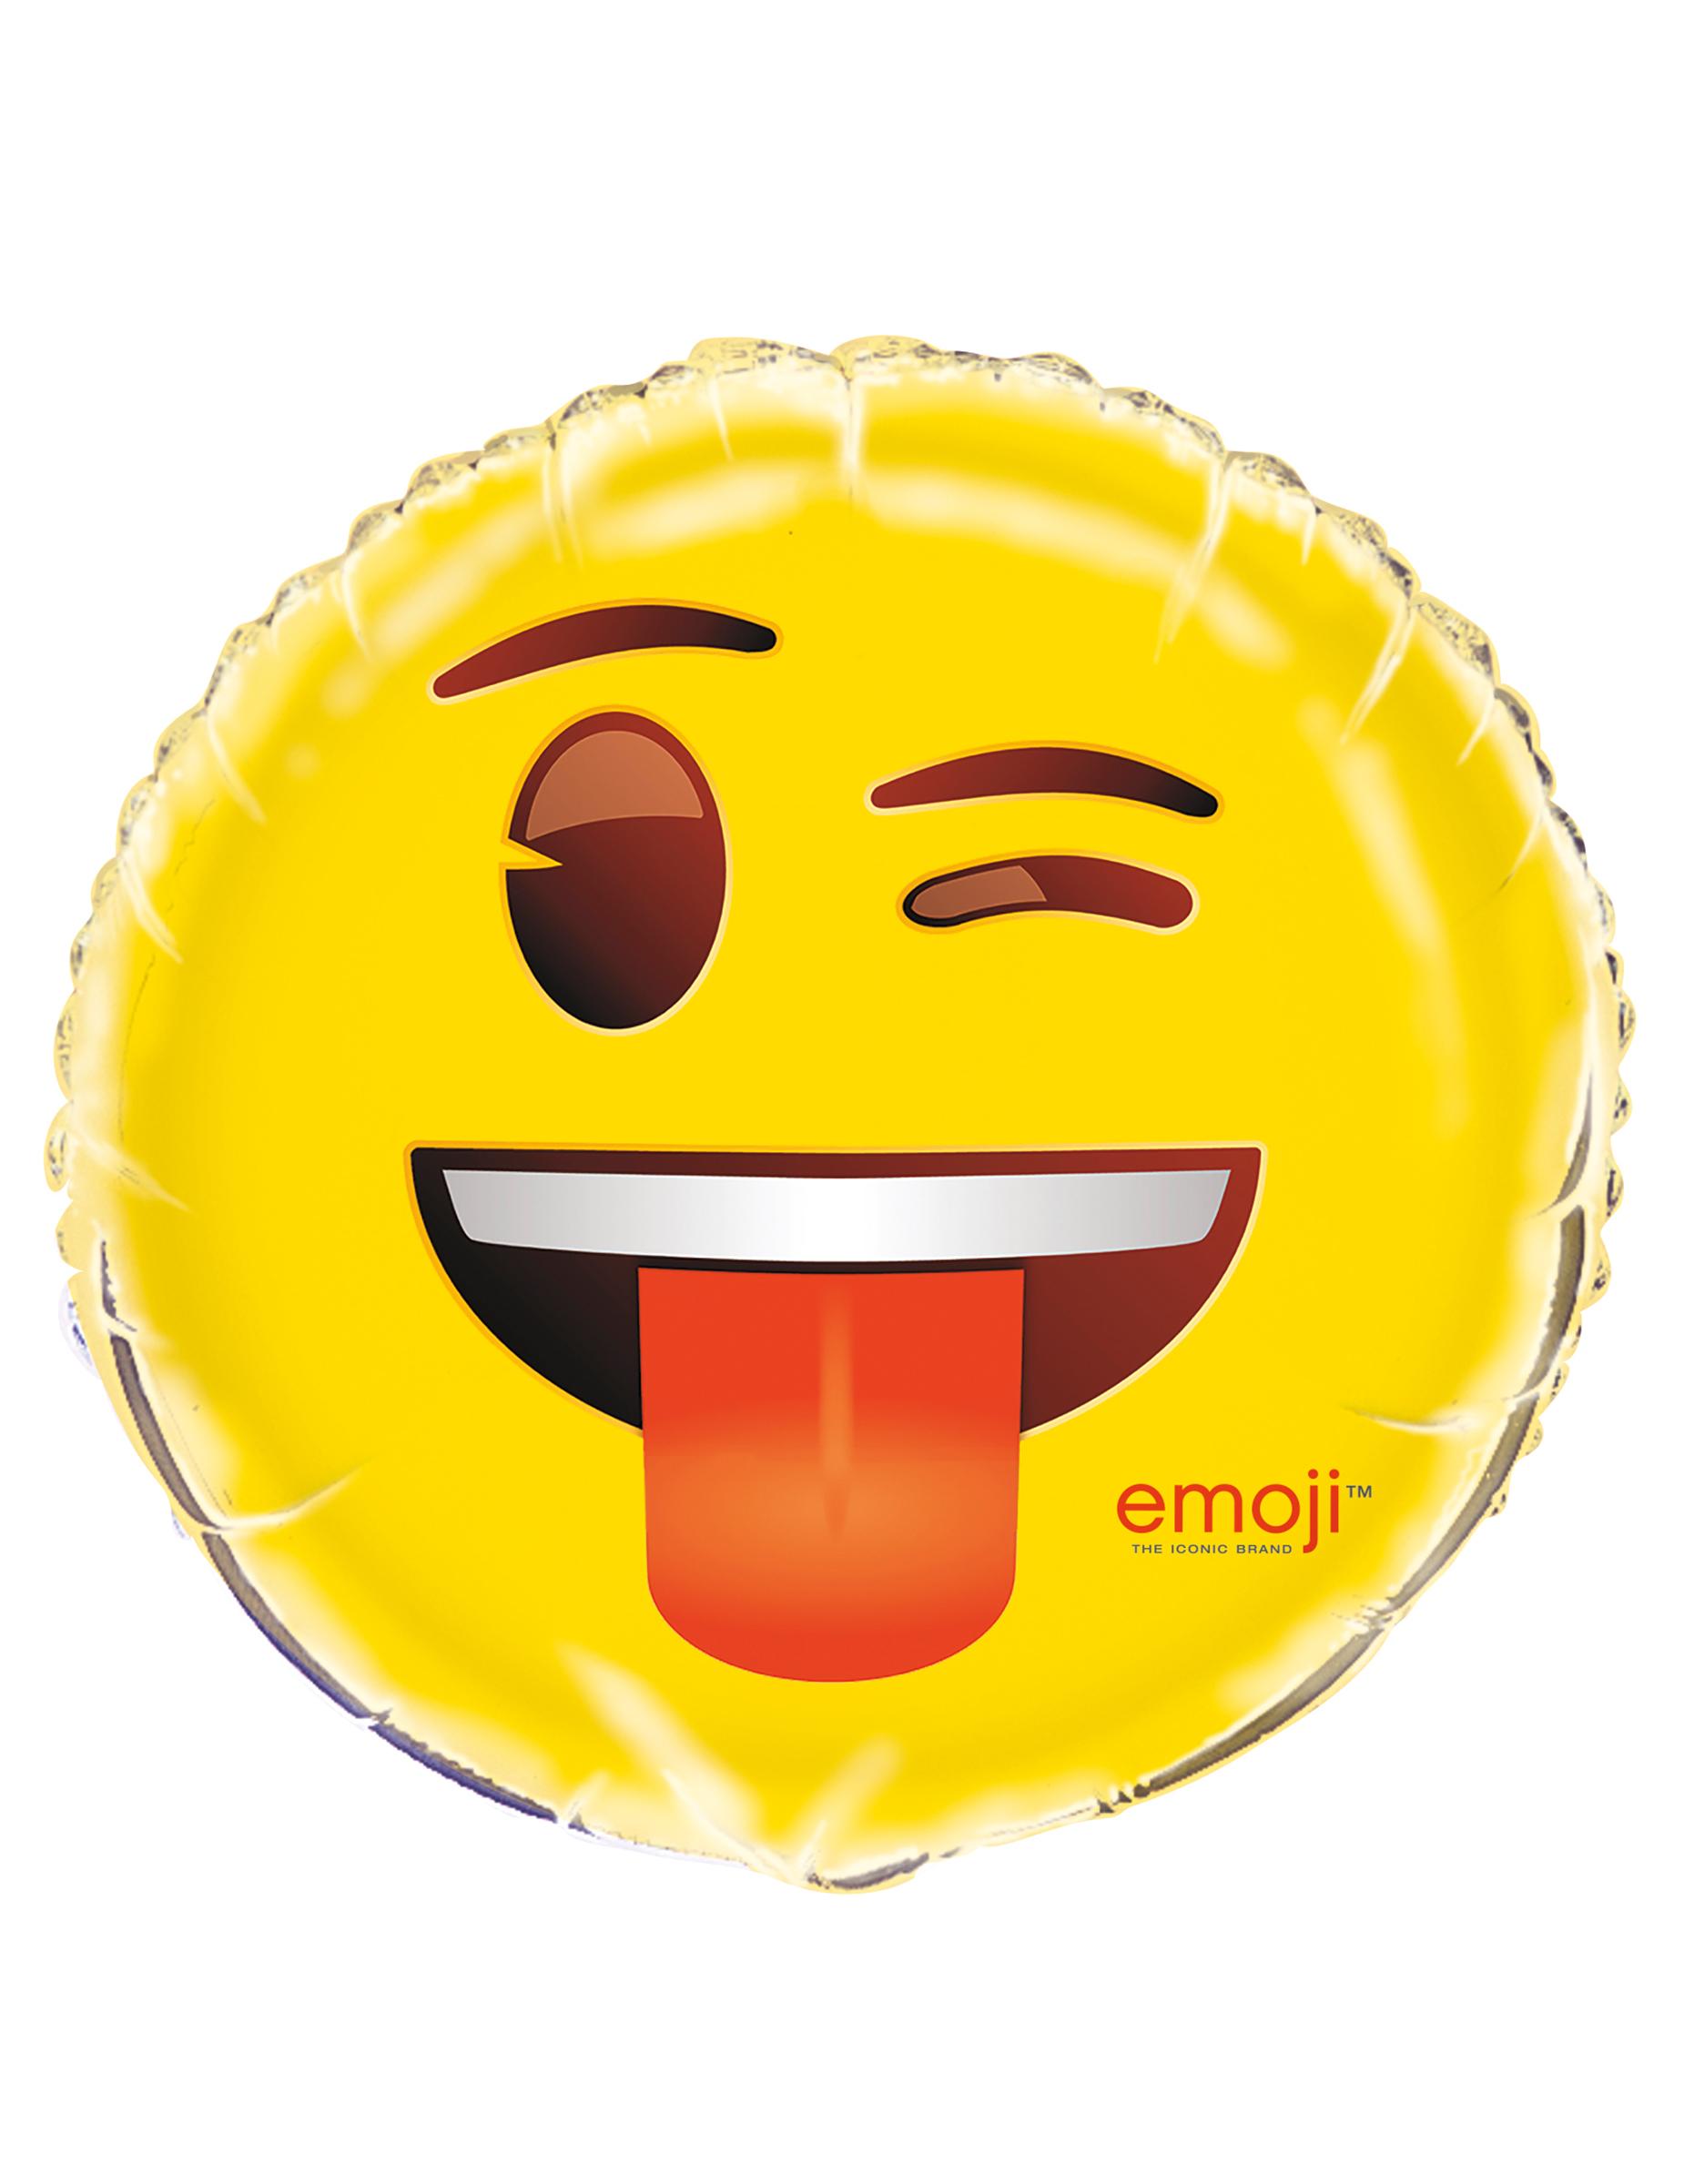 Emoji Aluminiumballon Zwinkerndes Gesicht Gunstige Faschings